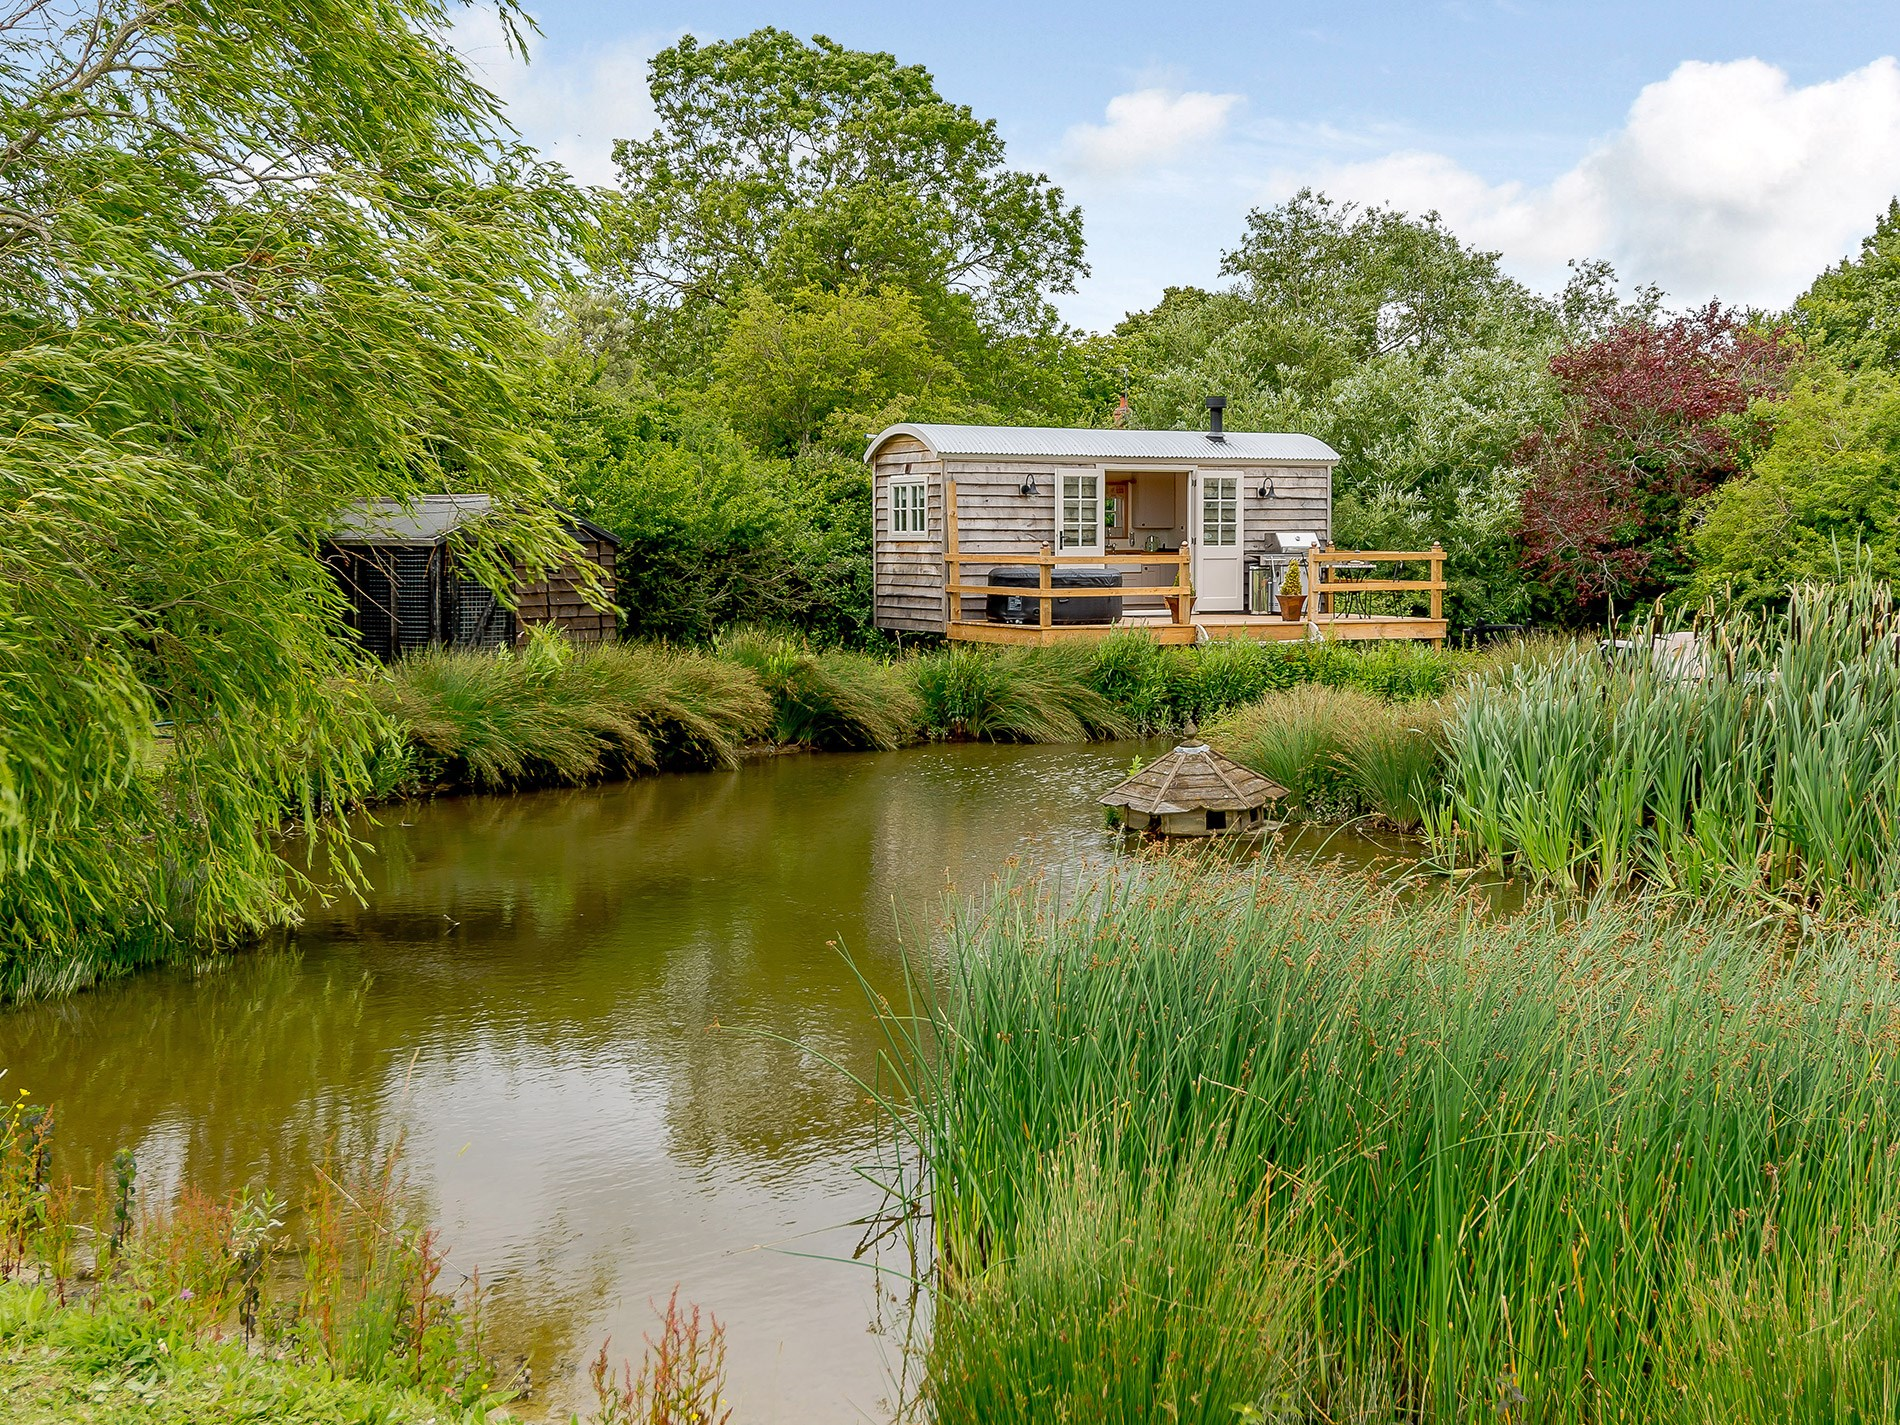 1 Bedroom Cottage in Aylesbury, Heart of England